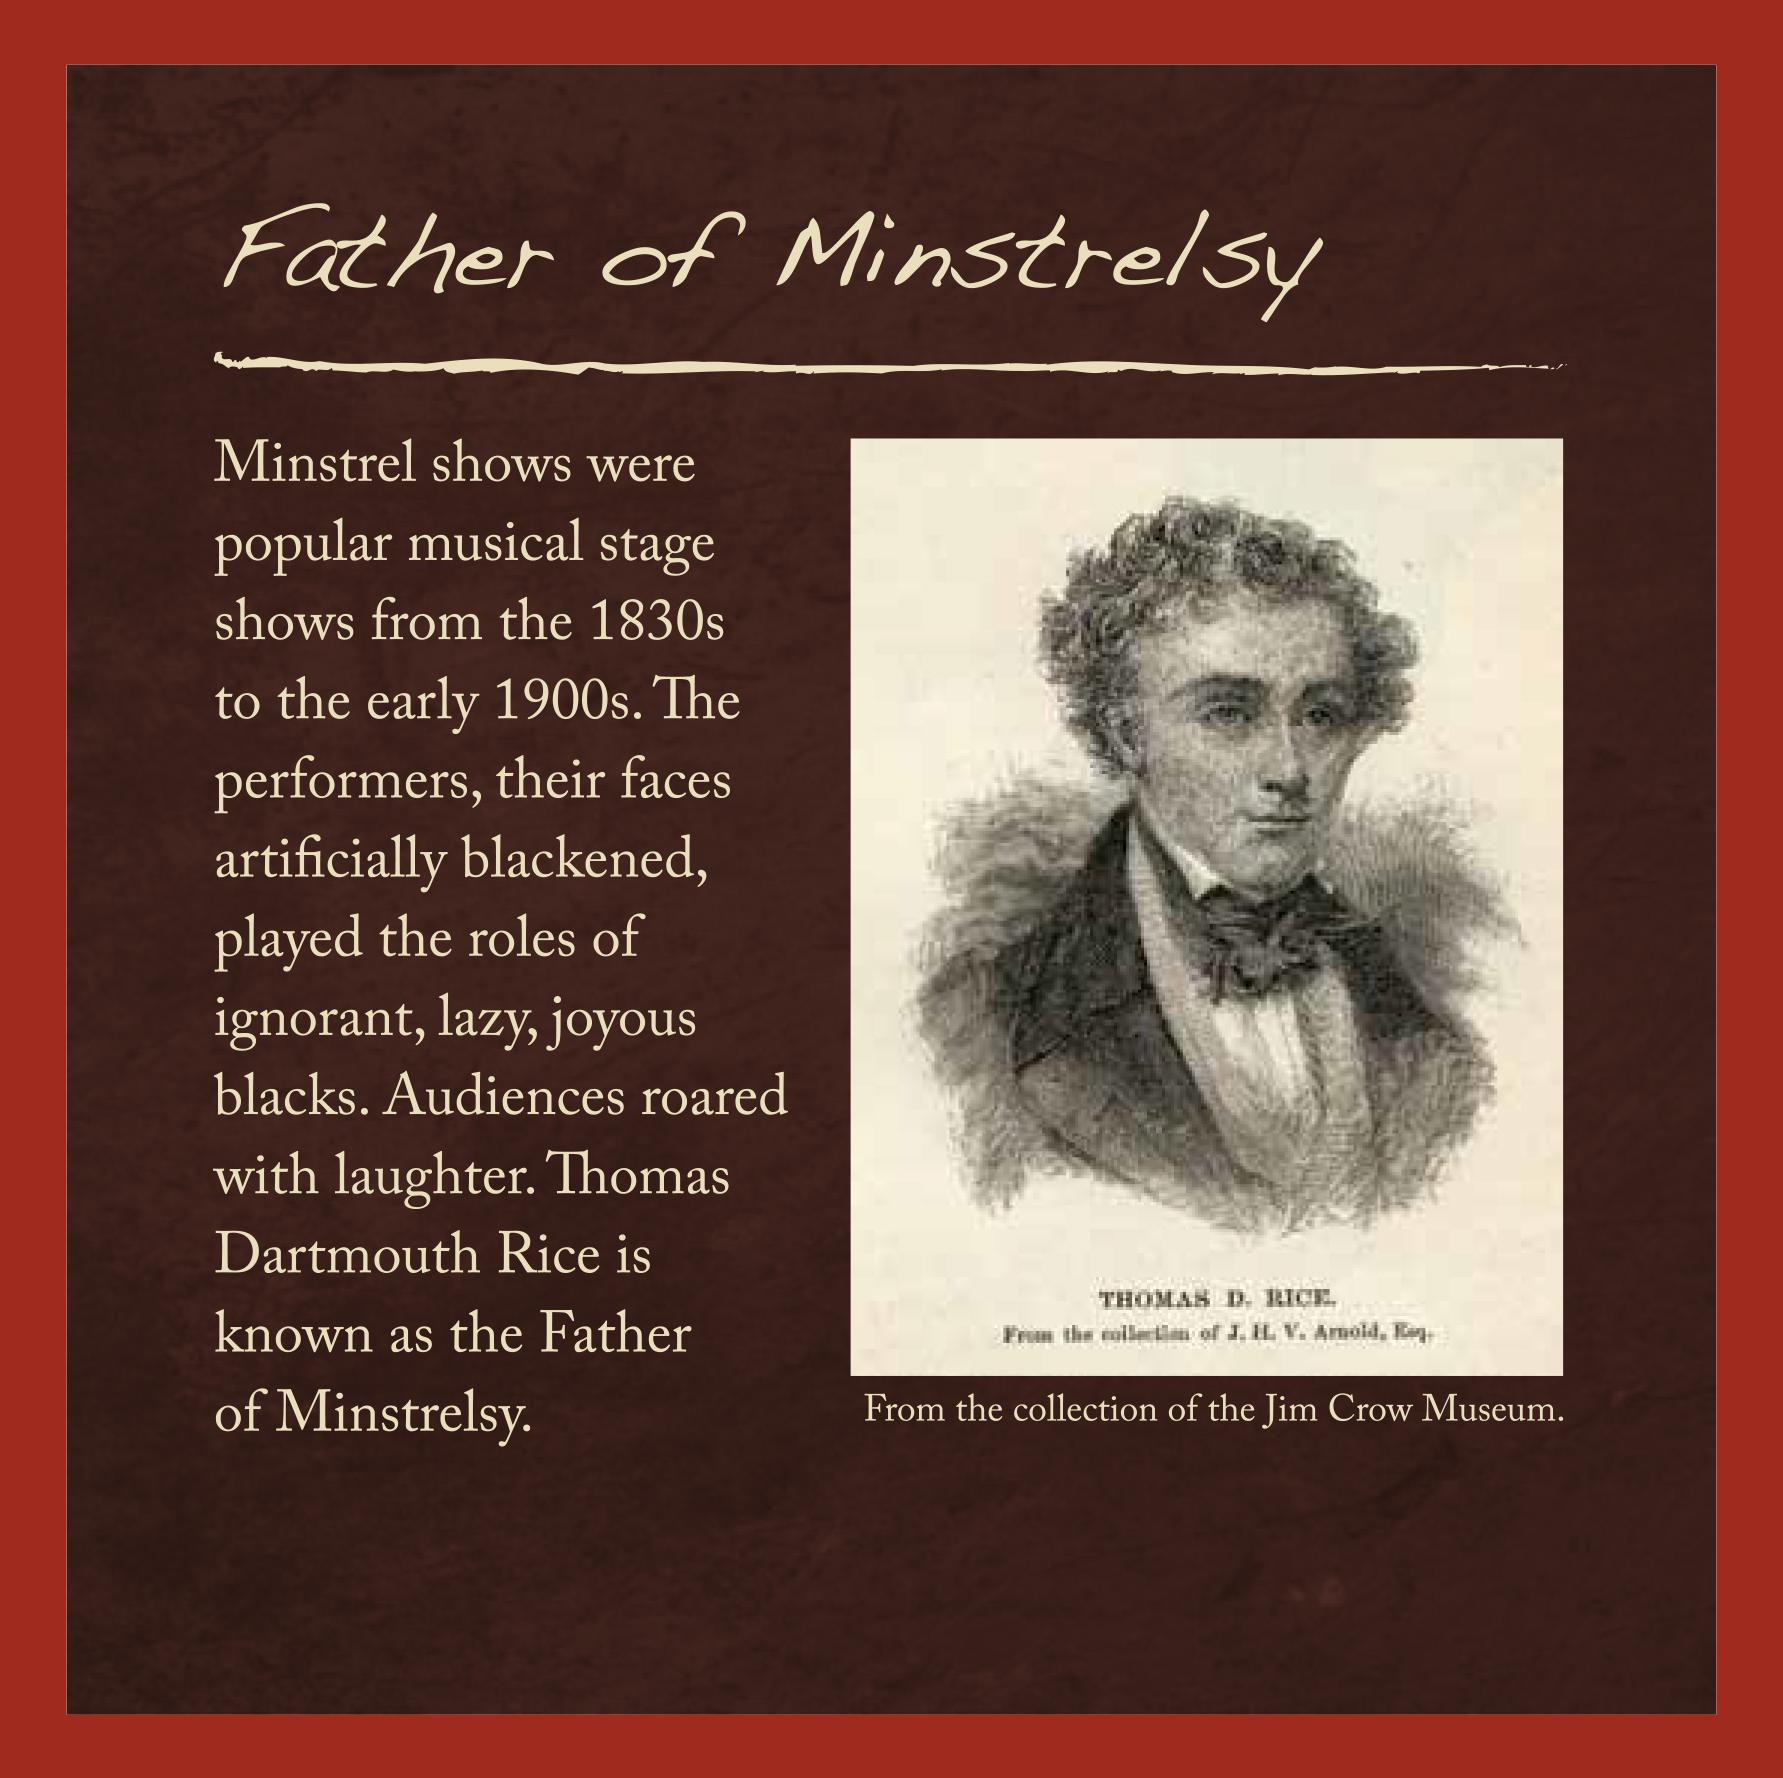 Father of Minstrelsy.jpg